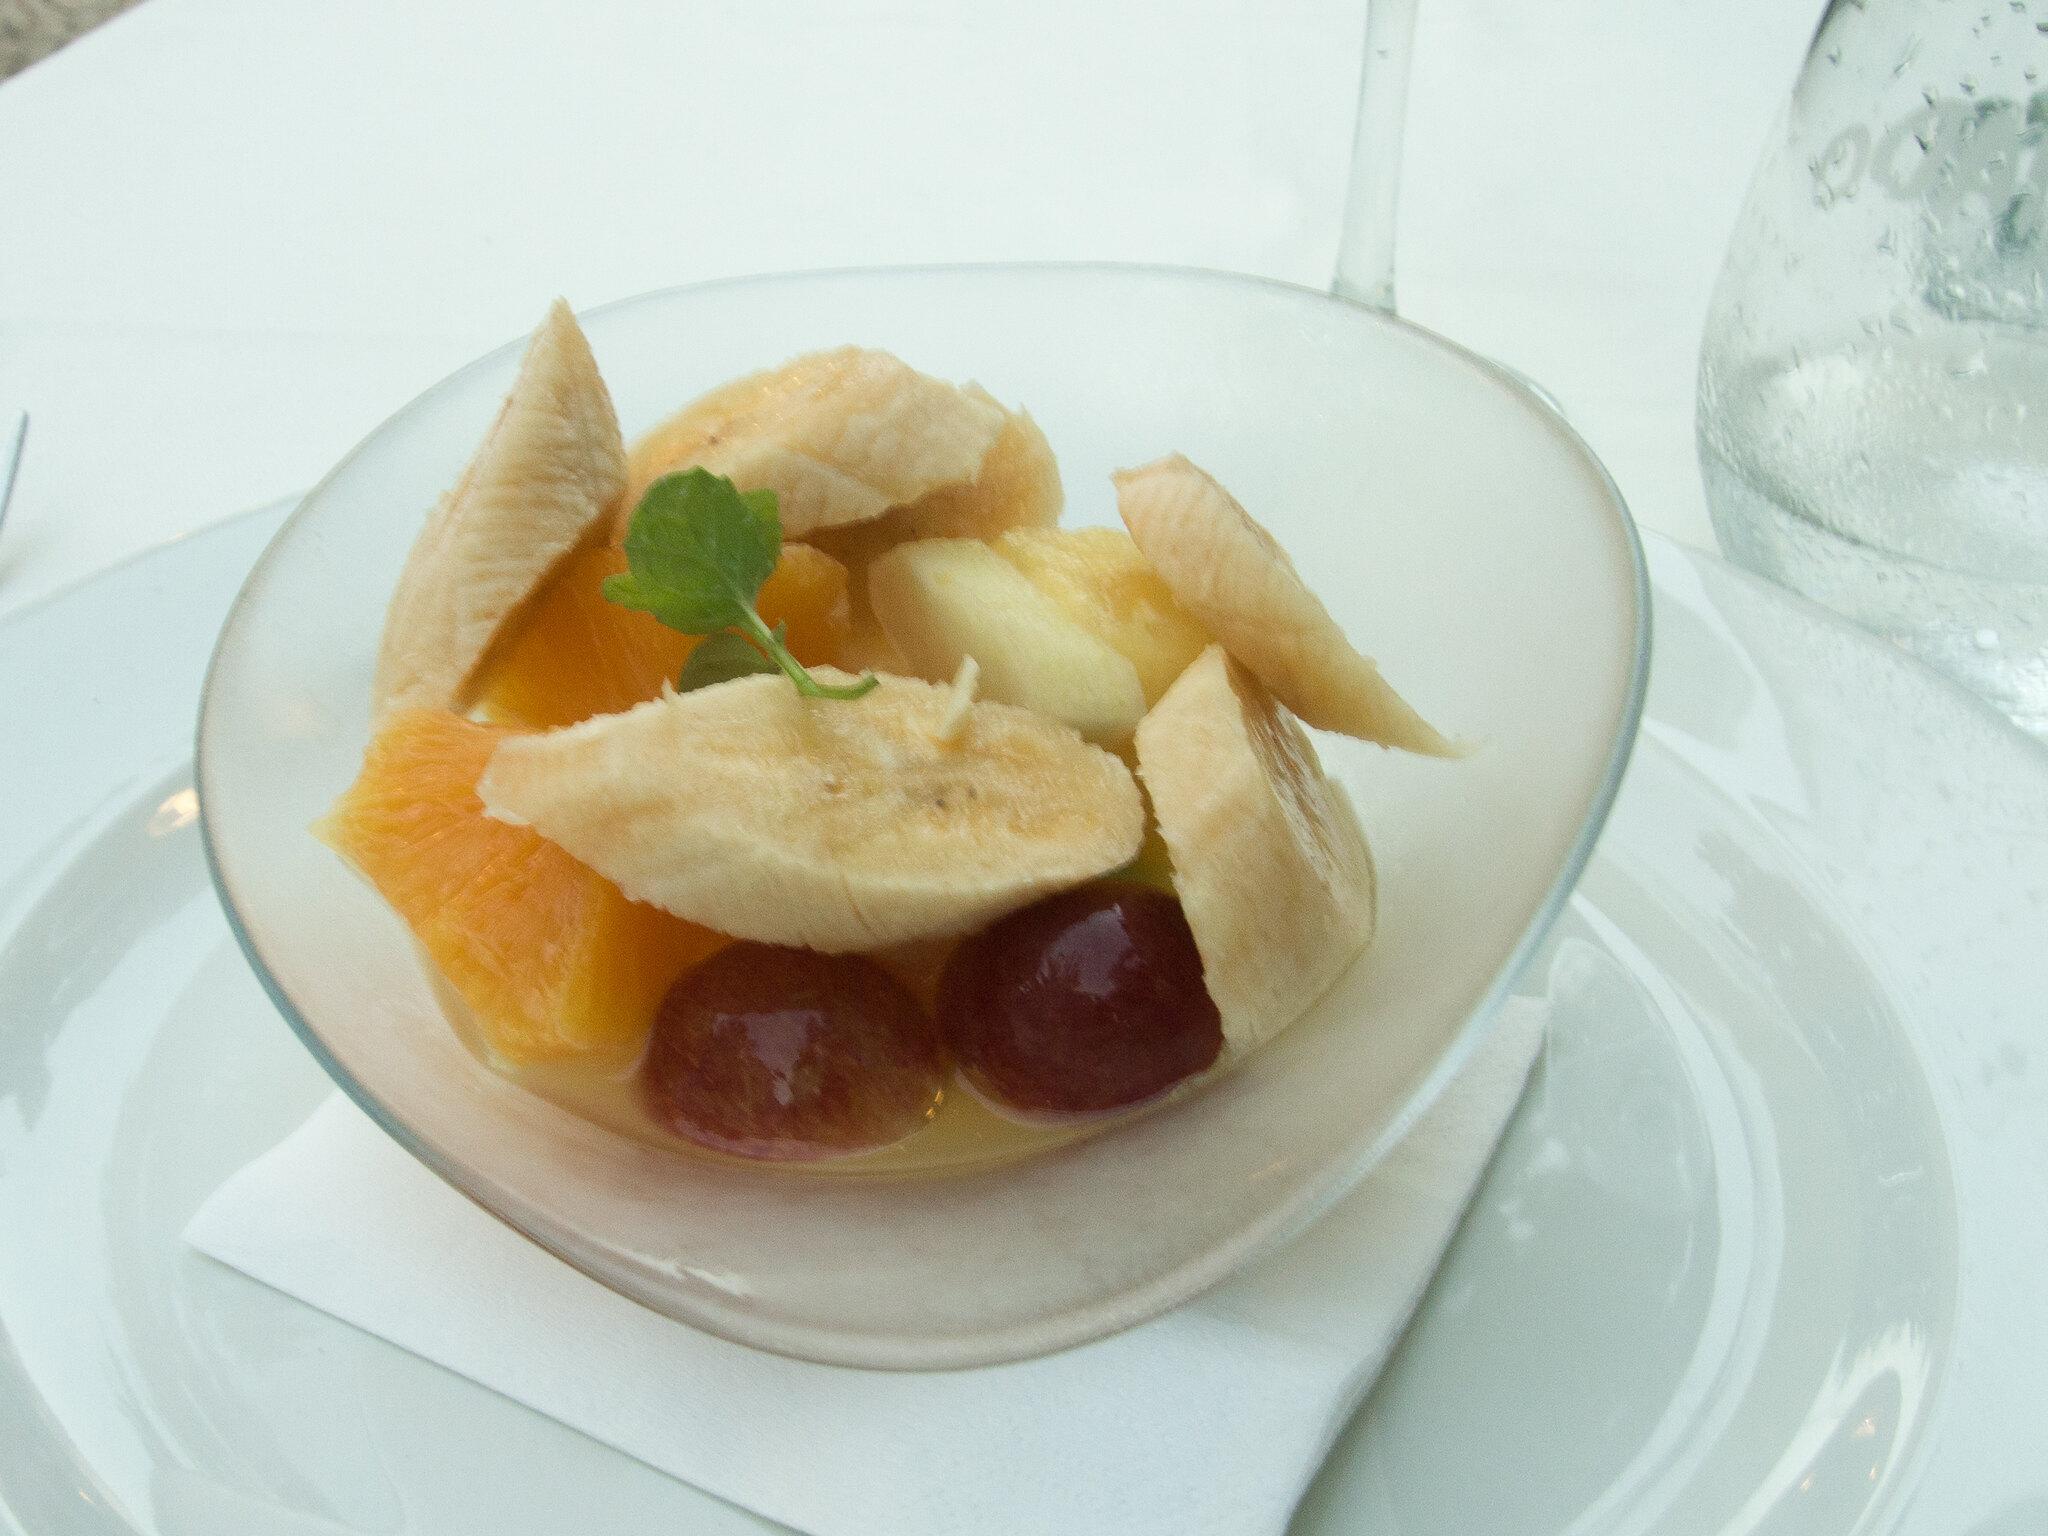 Madeira_restaurant_annukka_vuorela12